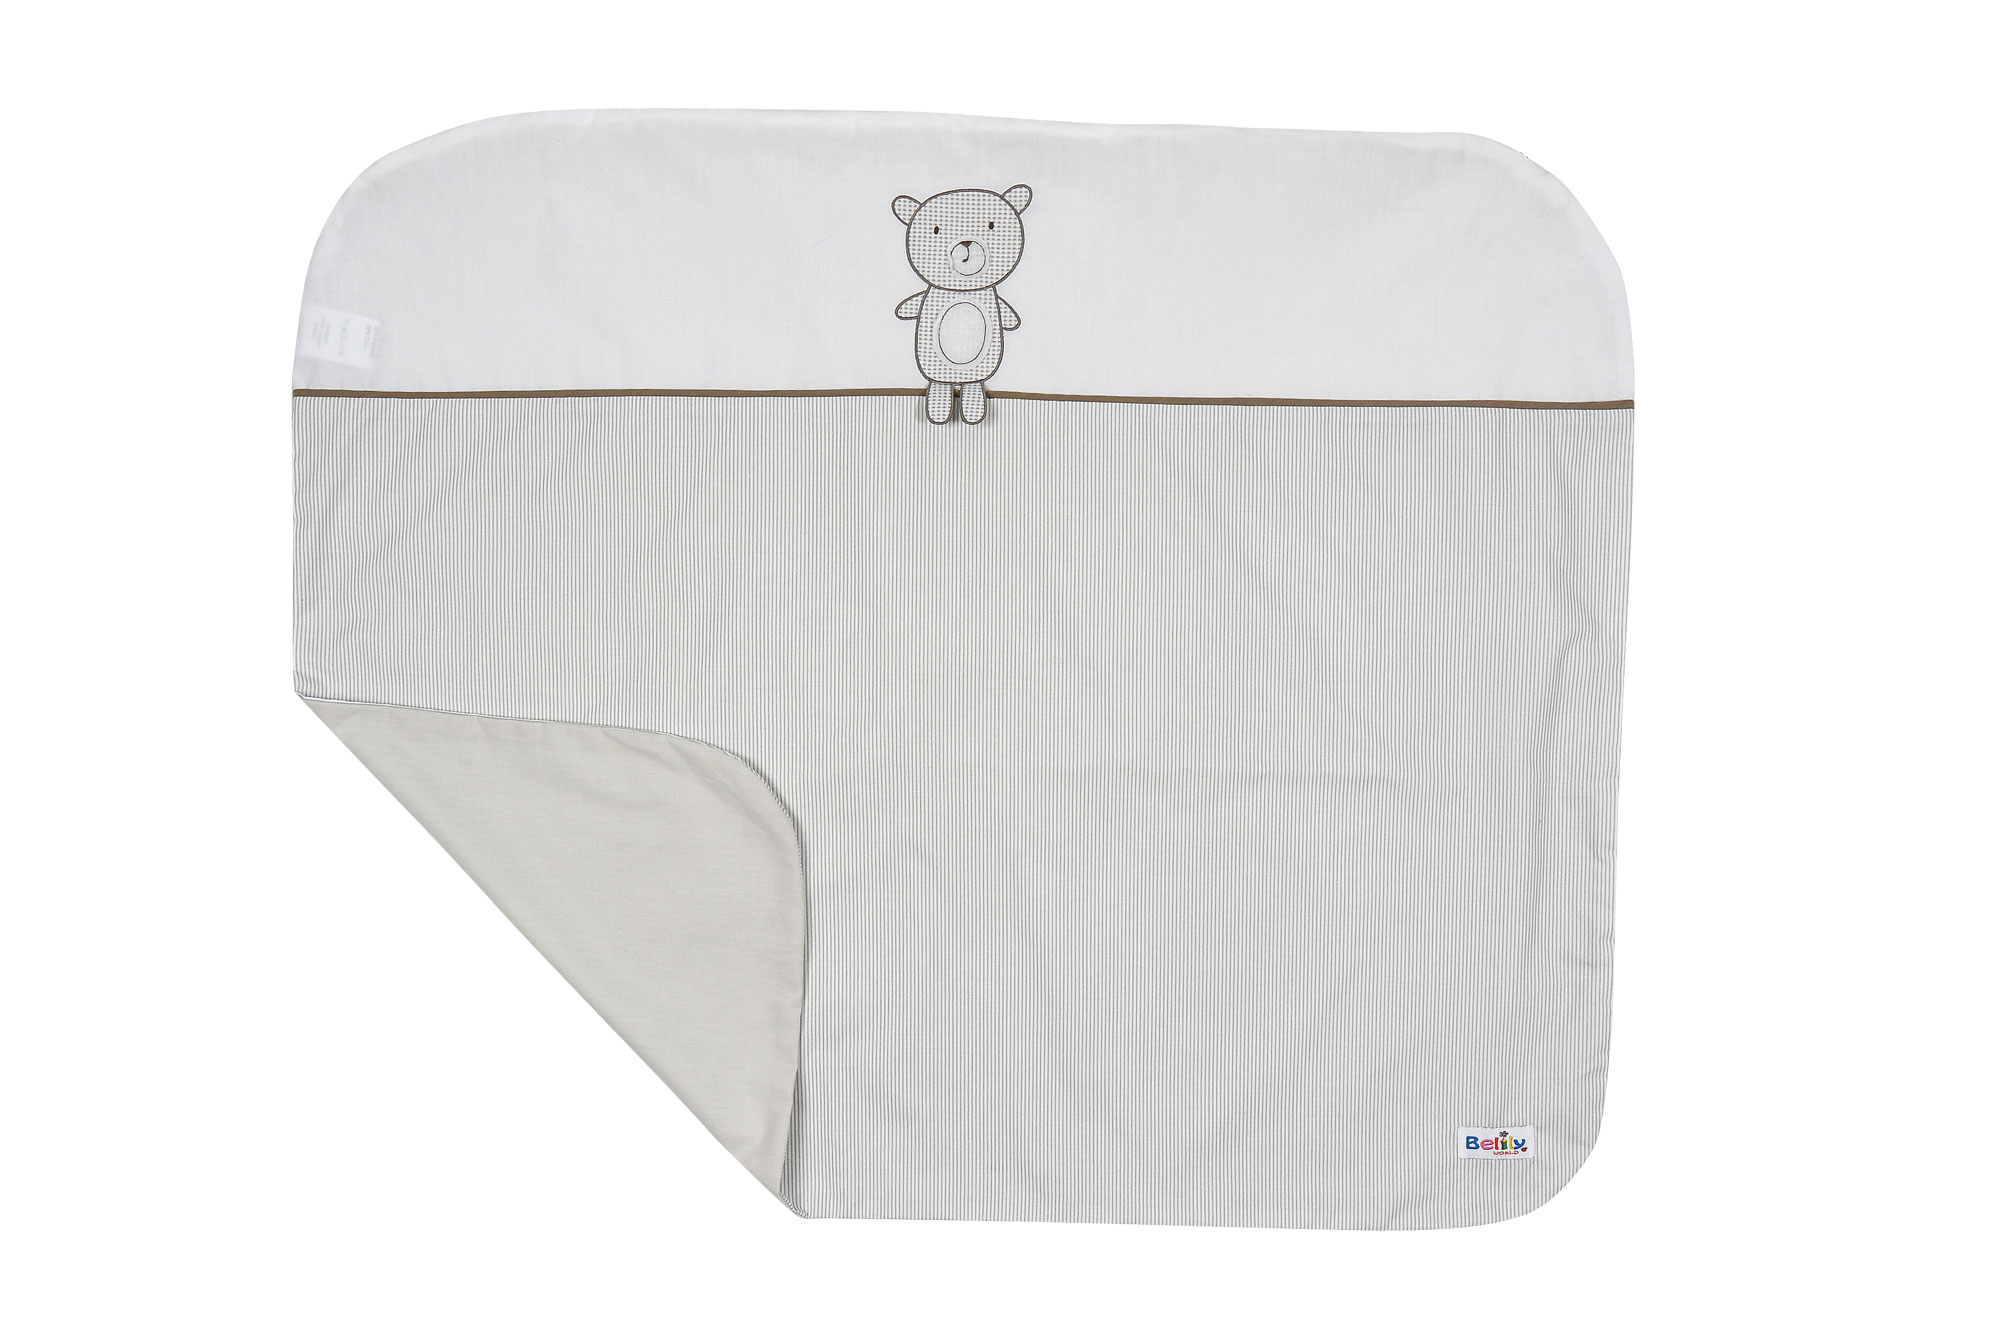 Tende Per Bambini Da Gioco : Belily wickelunterlagenbezug wickelauflagenbezug teddy teds zimmer